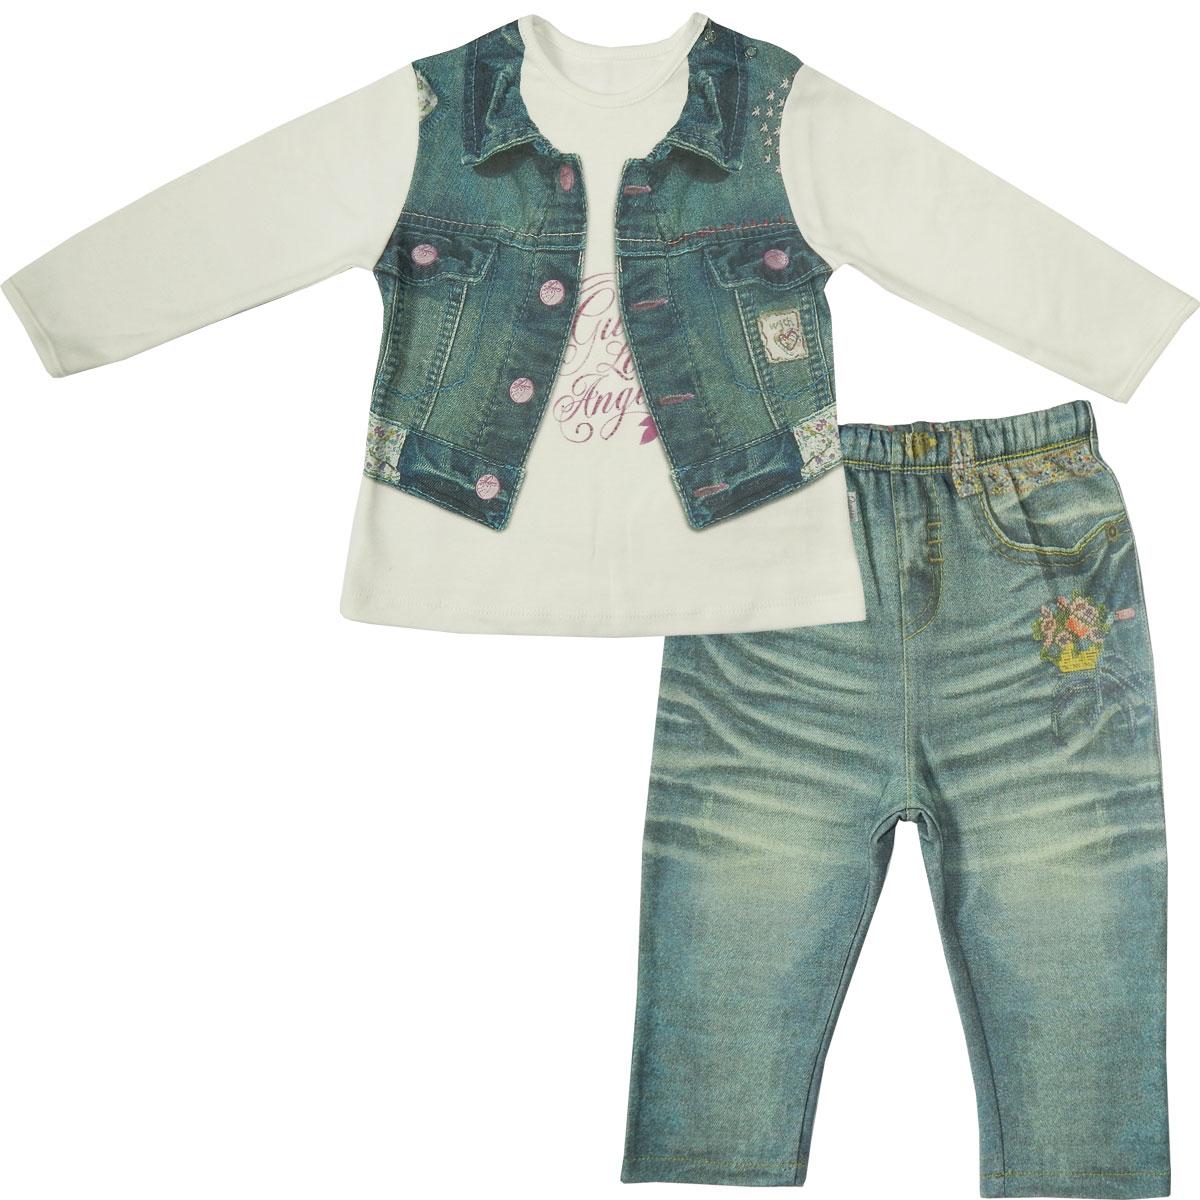 Комплект одежды Папитто для девочки Fashion Jeans 593-05 белый/синий р.24-80